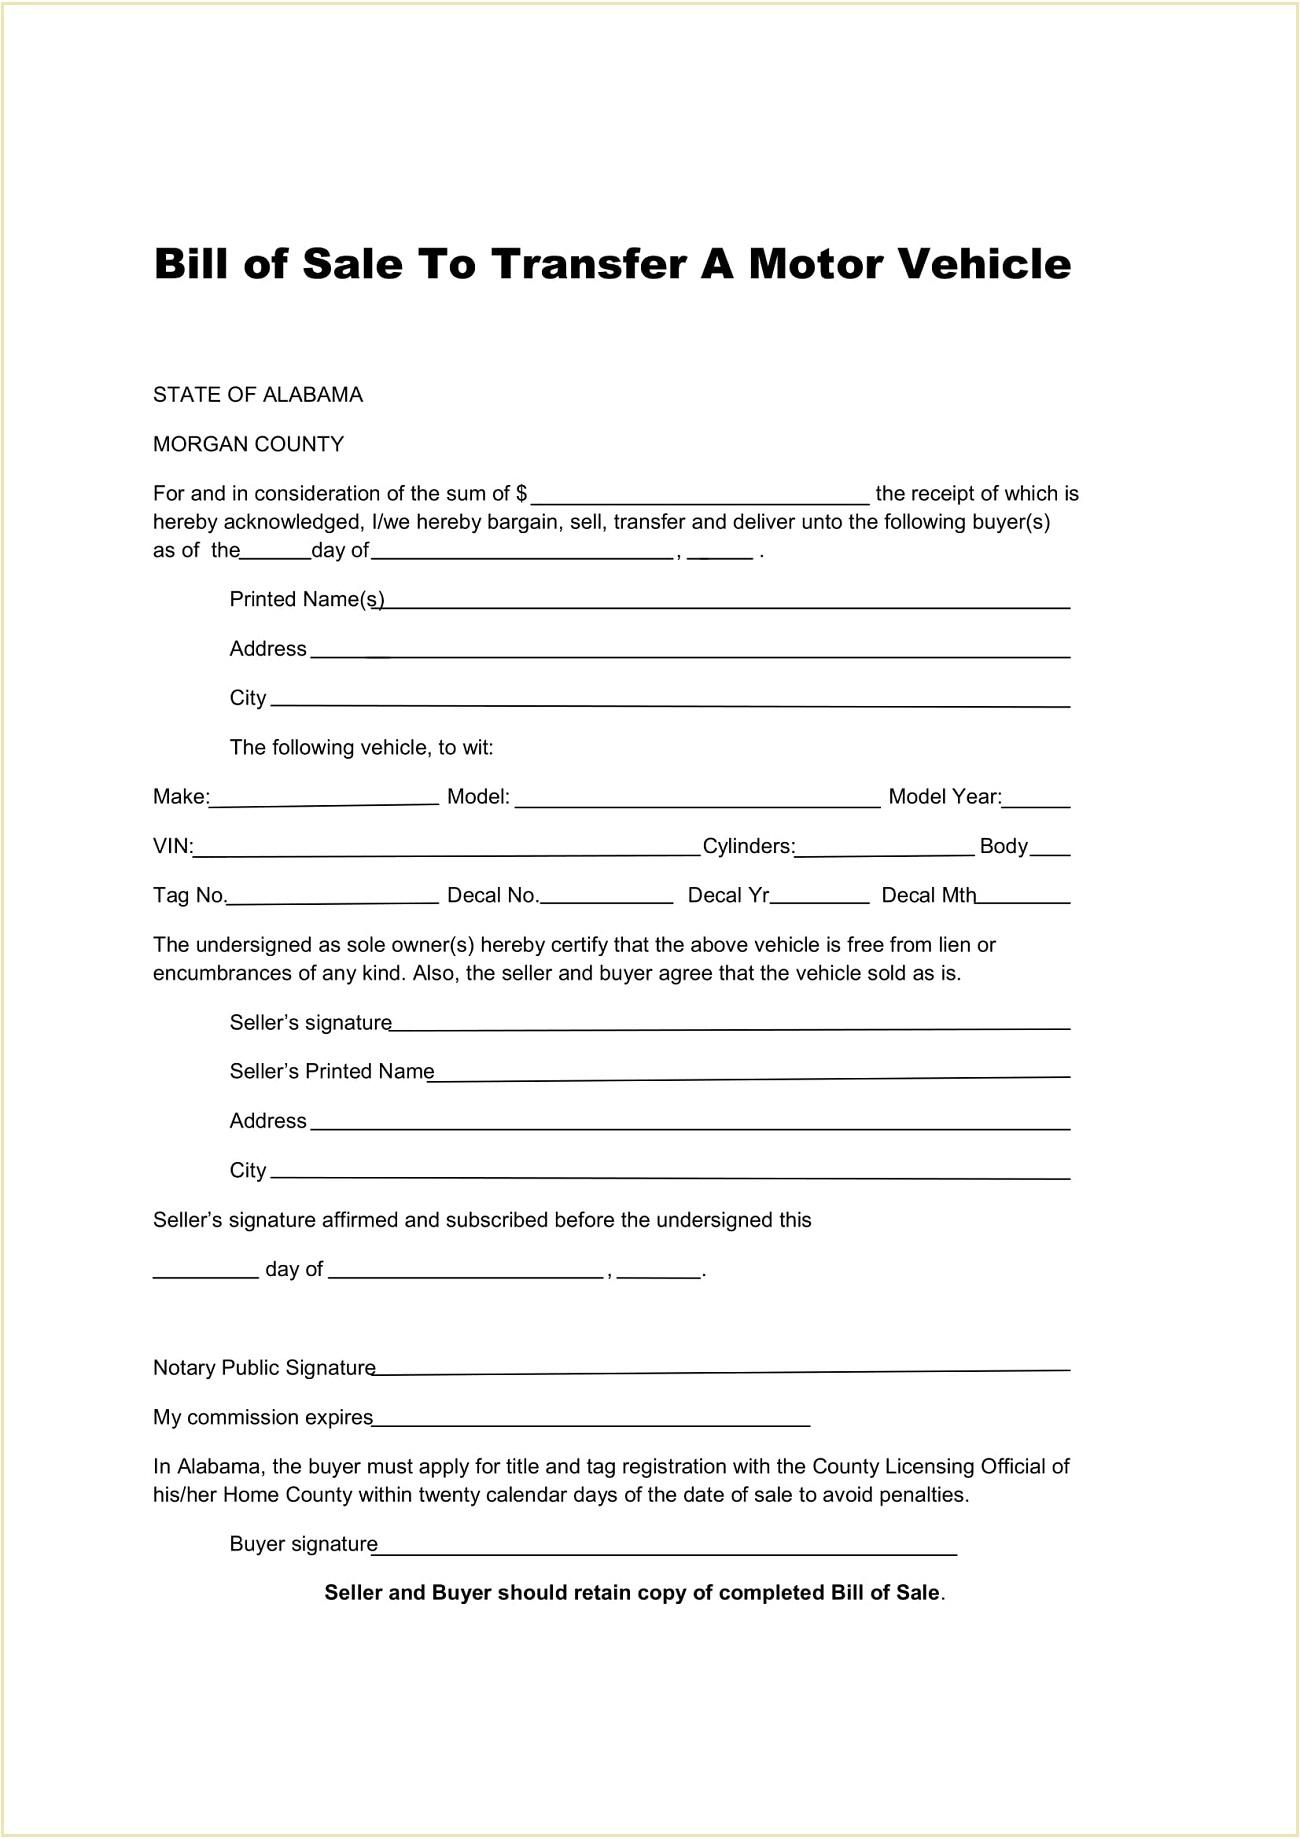 Morgan County DMV Alabama Motor Vehicle Bill of Sale Form Template PDF